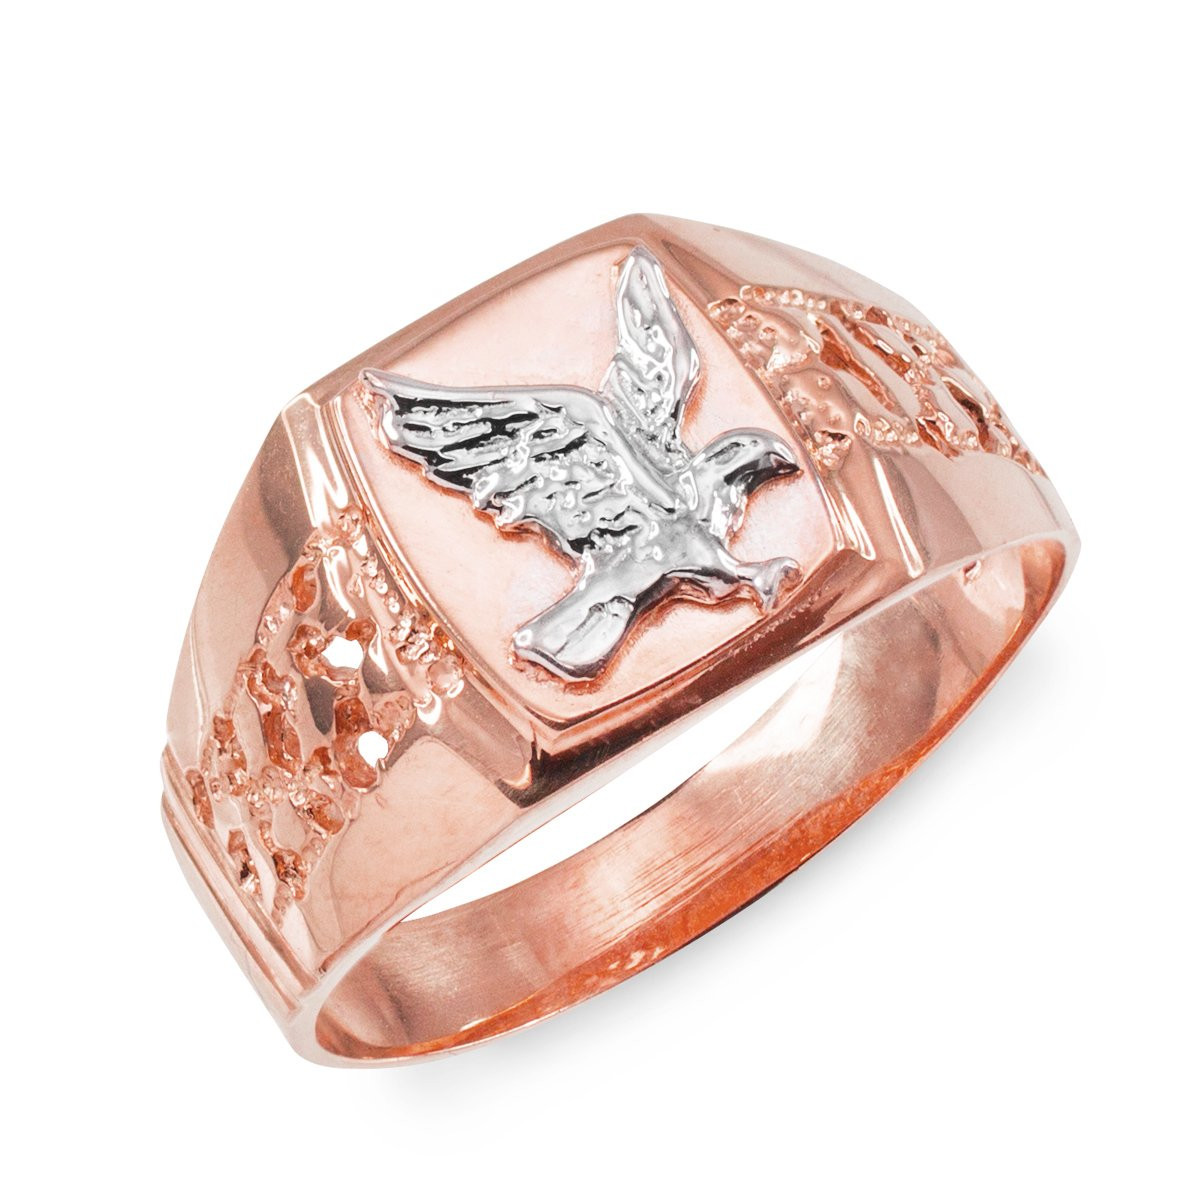 Men's Polished 10k Rose Gold Open Nugget Band American Eagle Ring (Size 10.75)